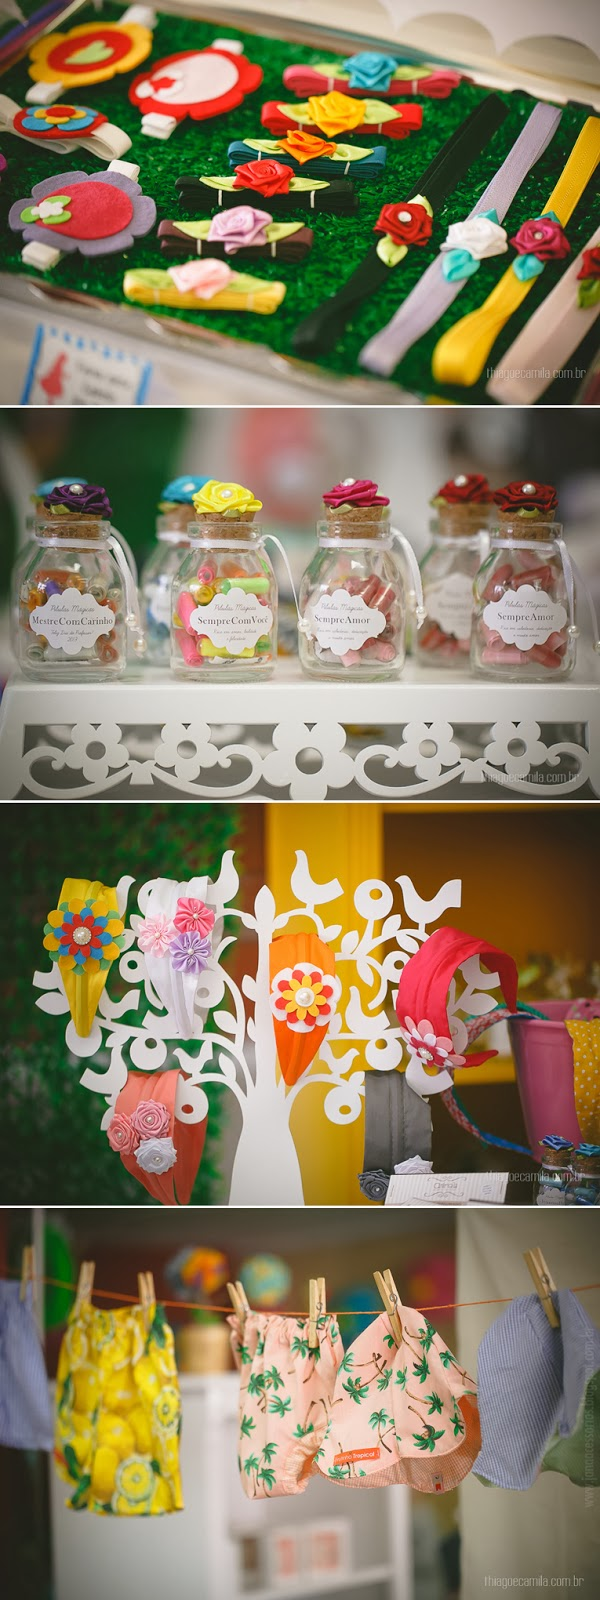 Joinville, artesanato, artesãs, Bazar Craft Ideas